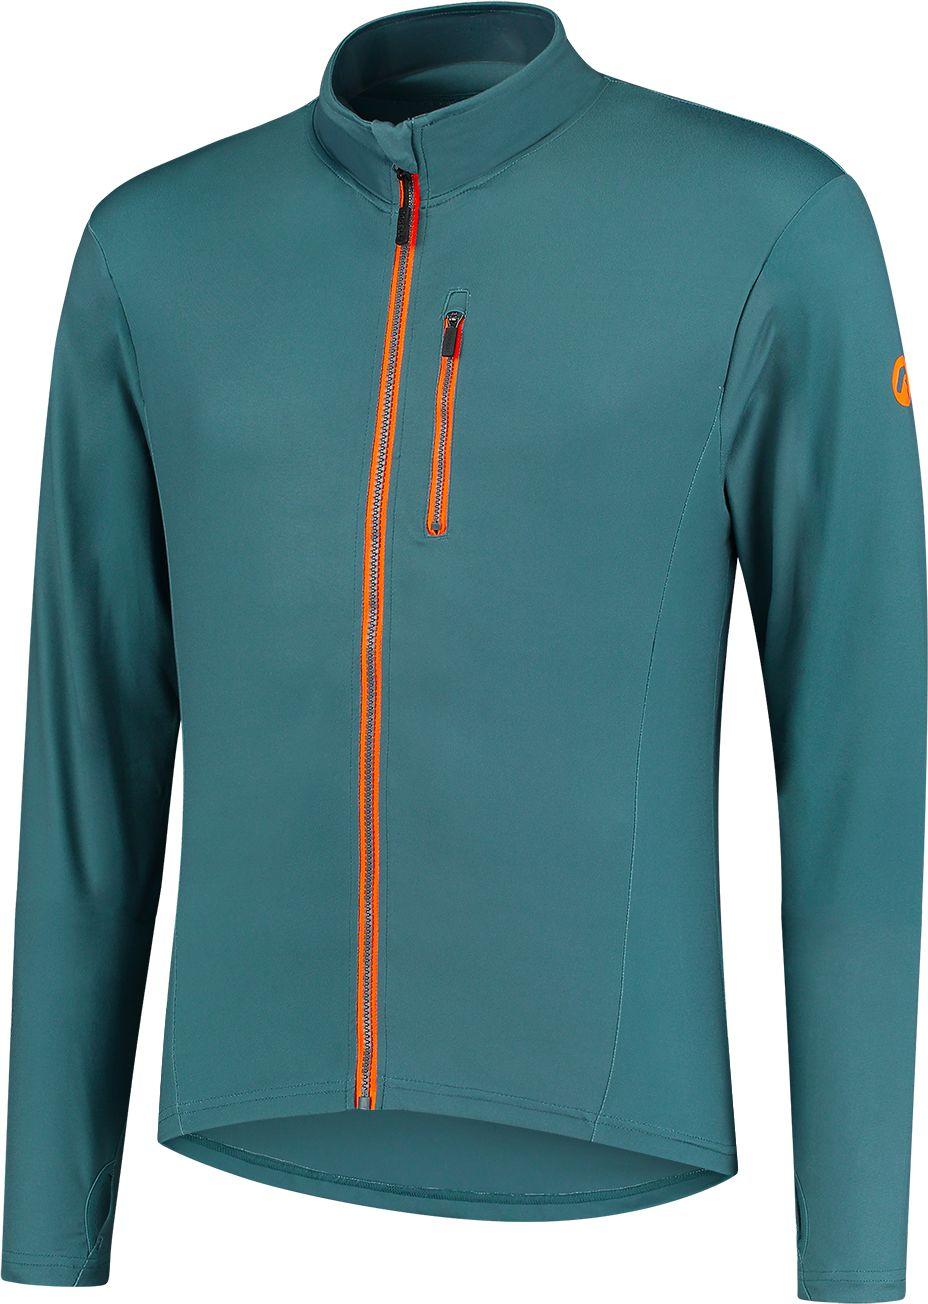 ROGELLI Bluza do biegania męska ESSENCE - niebieska Rozmiar: L,830.828.XL